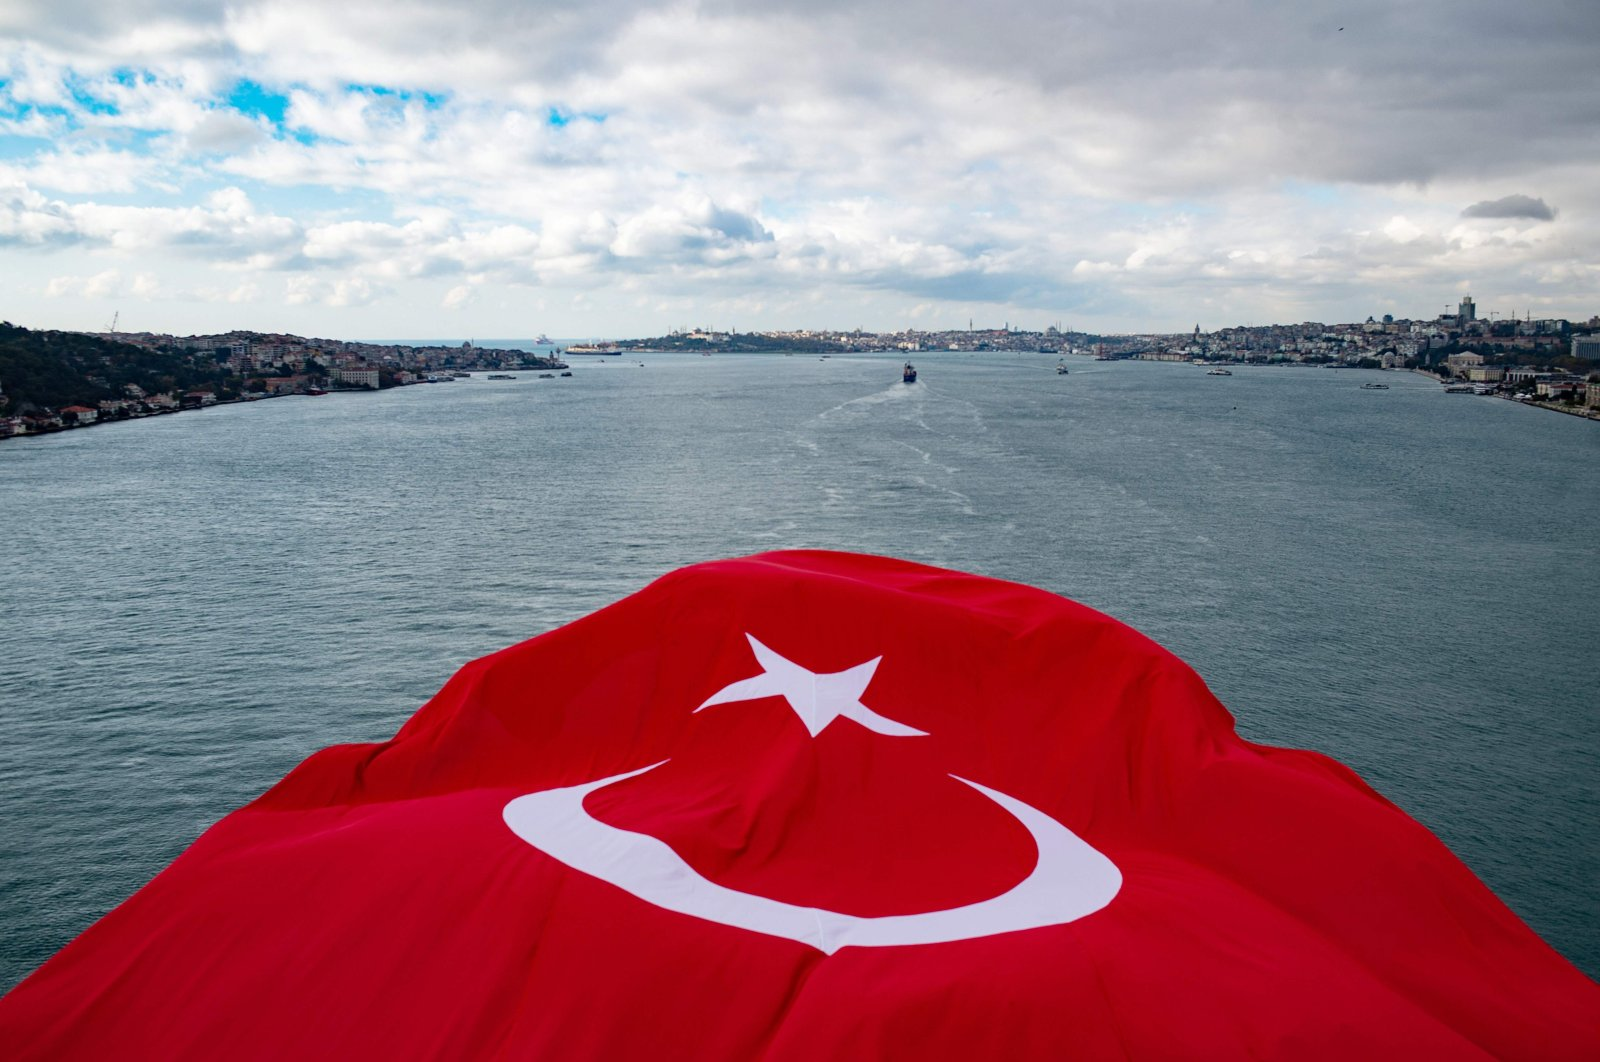 A Turkish national flag waves over the Bosporus on the July 15 Martyrs' Bridge, Istanbul, Turkey, Nov. 8, 2020. (AFP Photo)